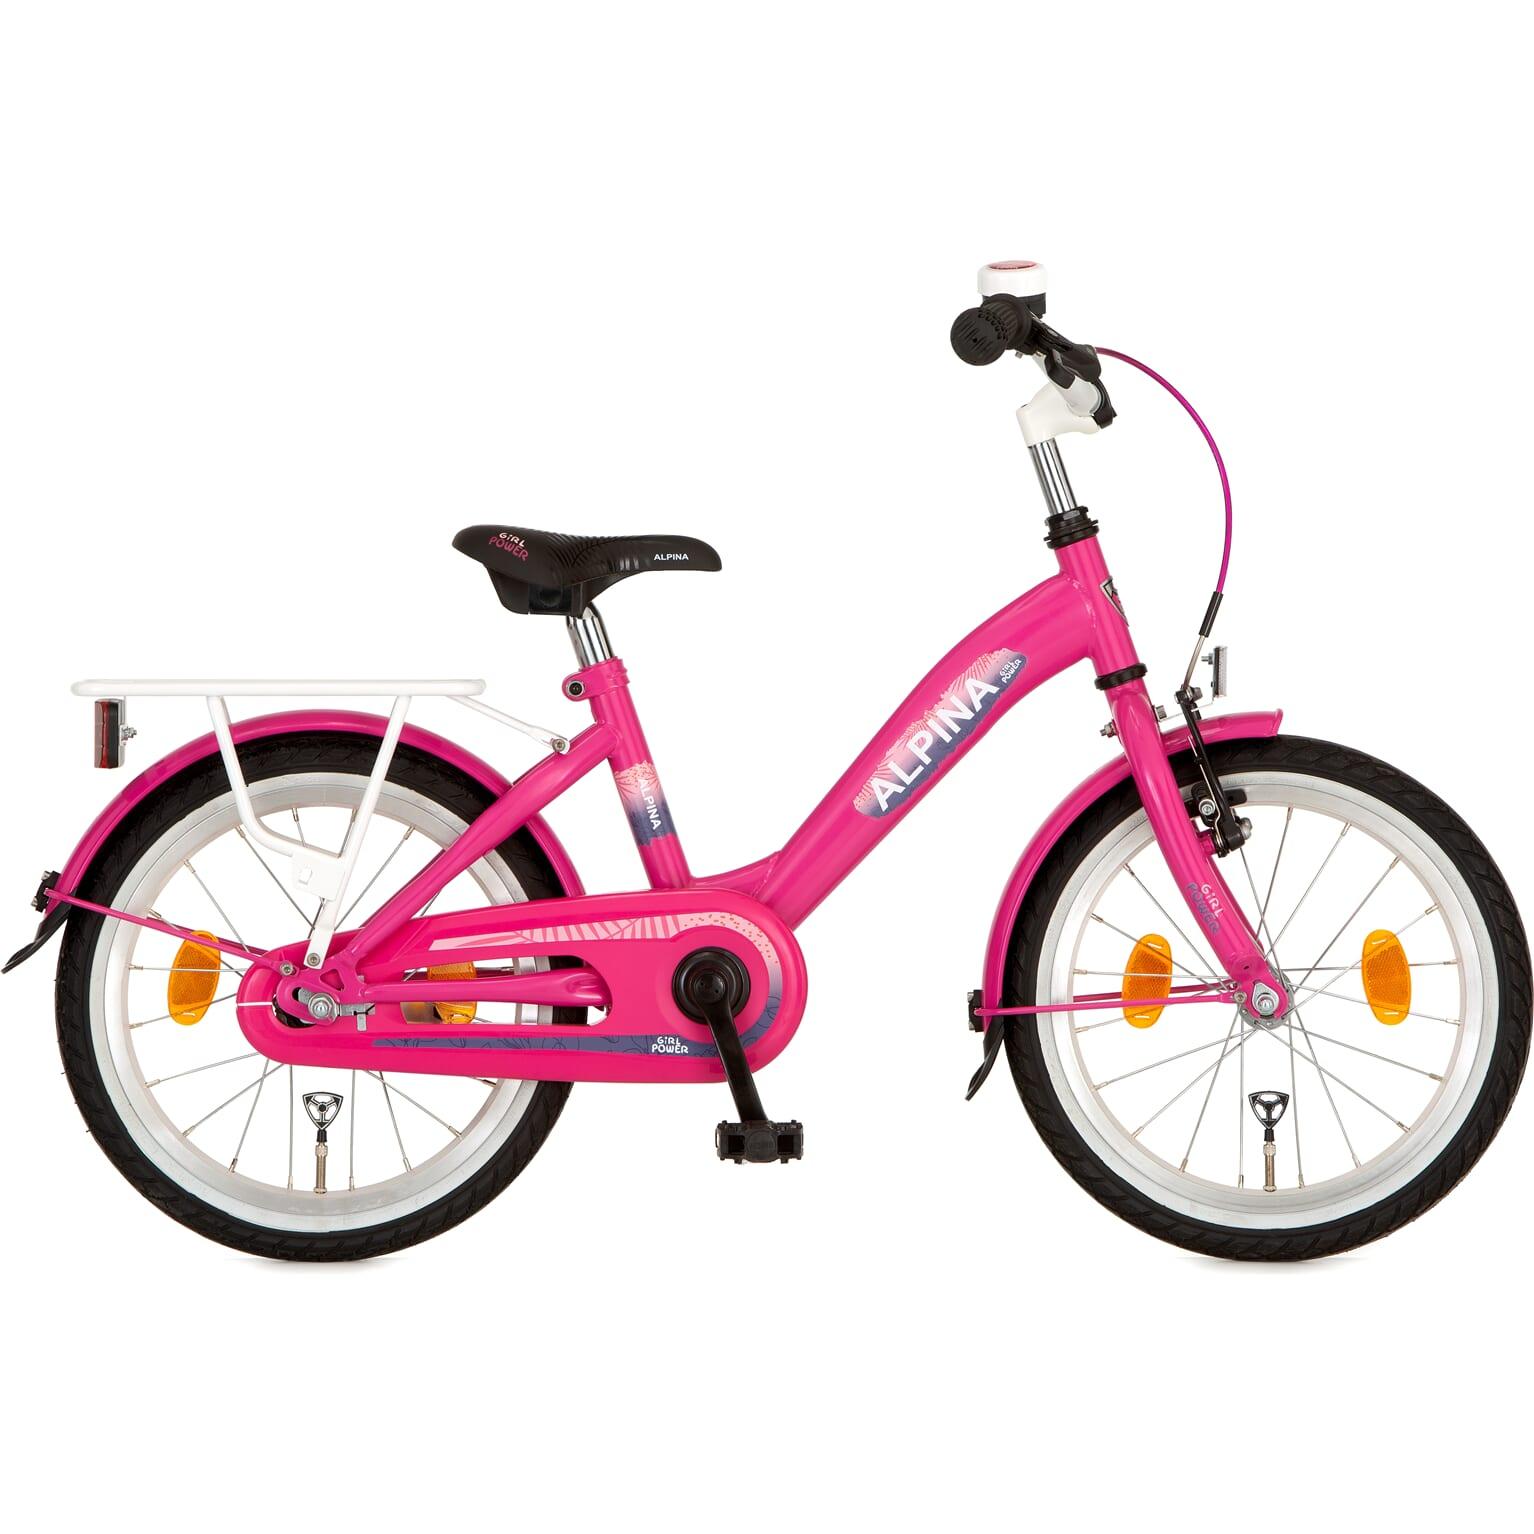 Alpina Girlpower M16 Candy Pink